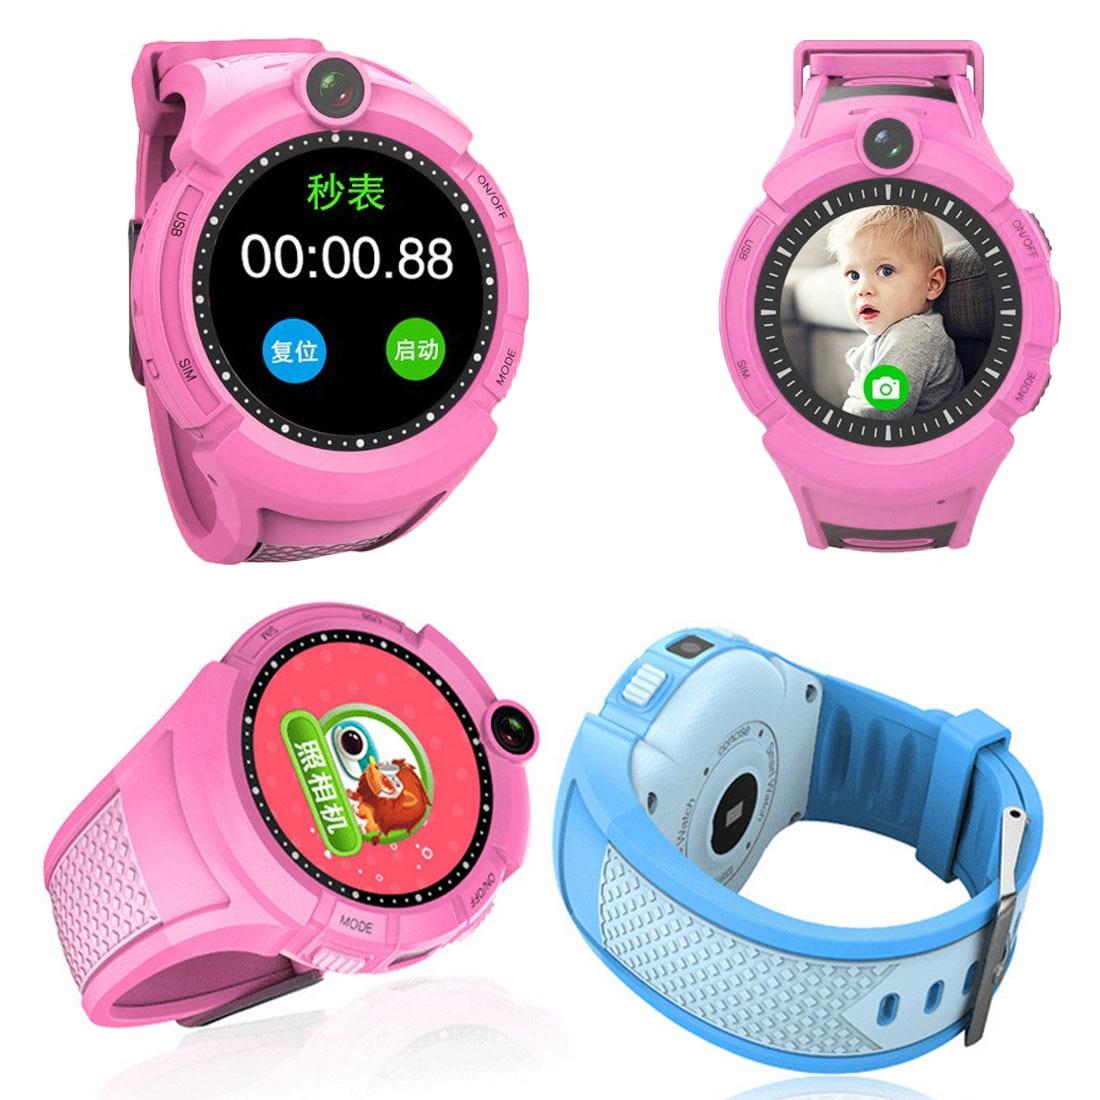 Q360 Kids Round Screen Smart Watch with Camera GPS WIFI Location Child smartwatch SOS Anti-Lost Monitor Tracker baby WristWatch wokka watch q360 pink